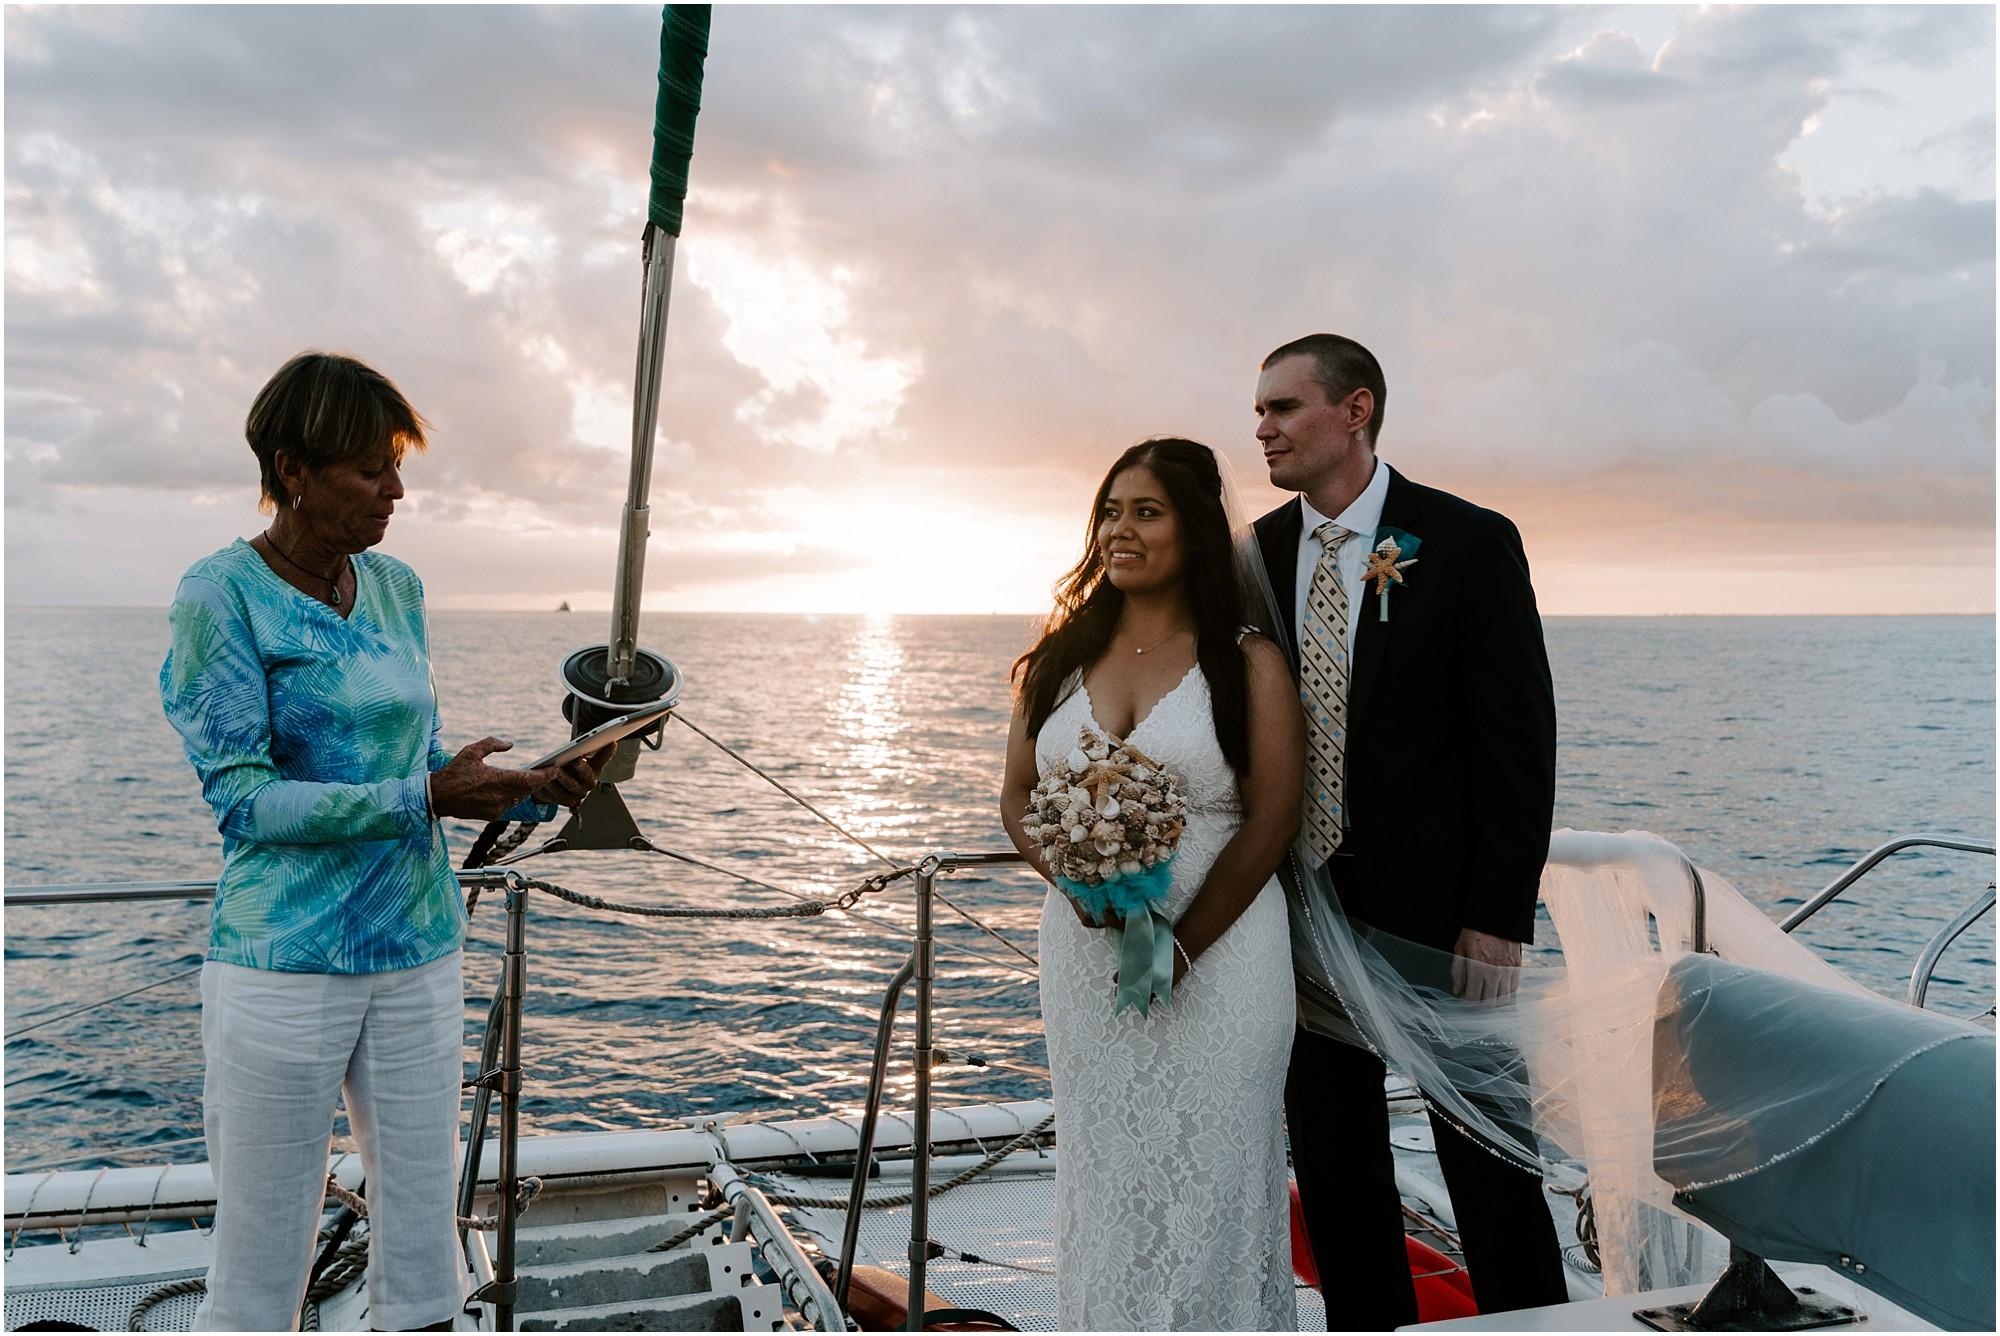 oahu-intimate-wedding-catamaran-honolulu_0019.jpg